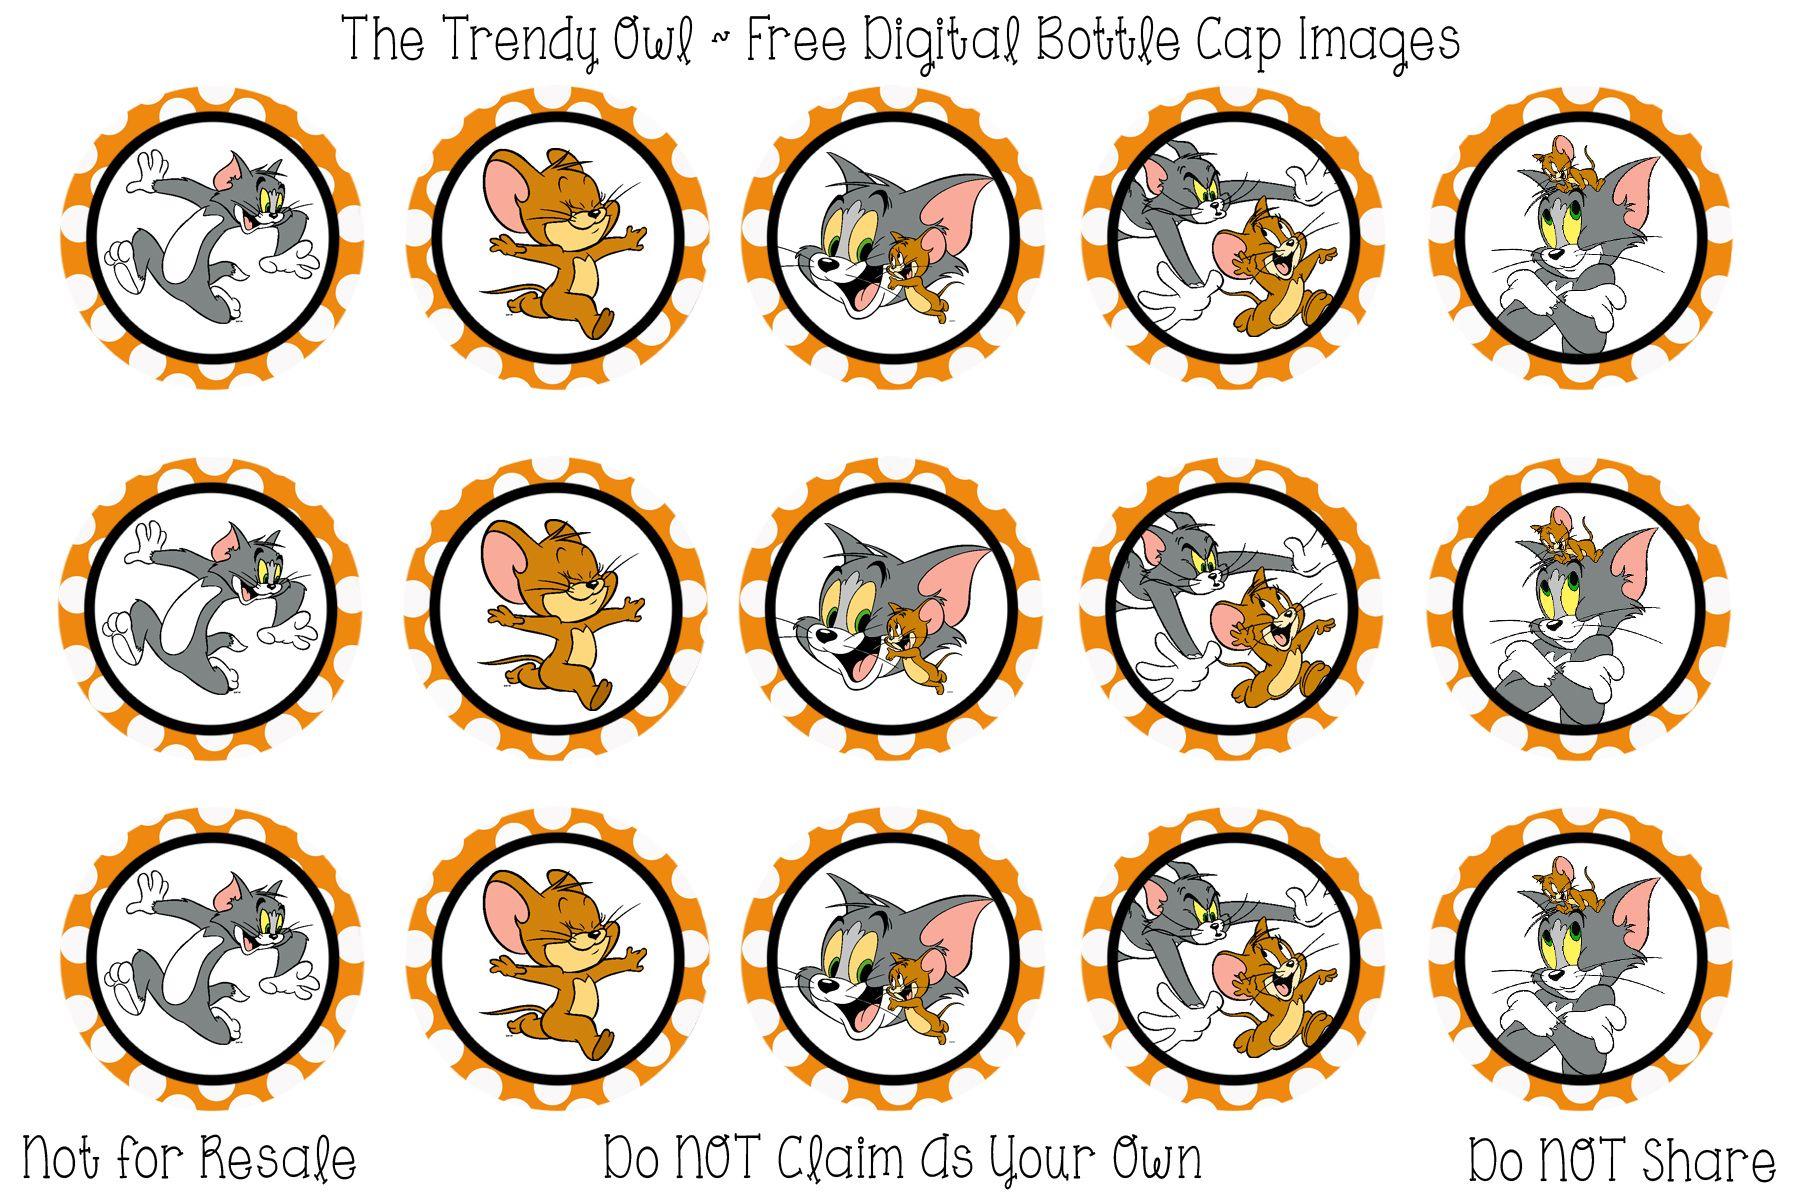 Tom & Jerry <3 Retired images uploaded as freebies! Enjoy! ~ FREE Digital Bottle Cap Images!! https://www.facebook.com/thetrendyowlUS http://www.thetrendyowl.com